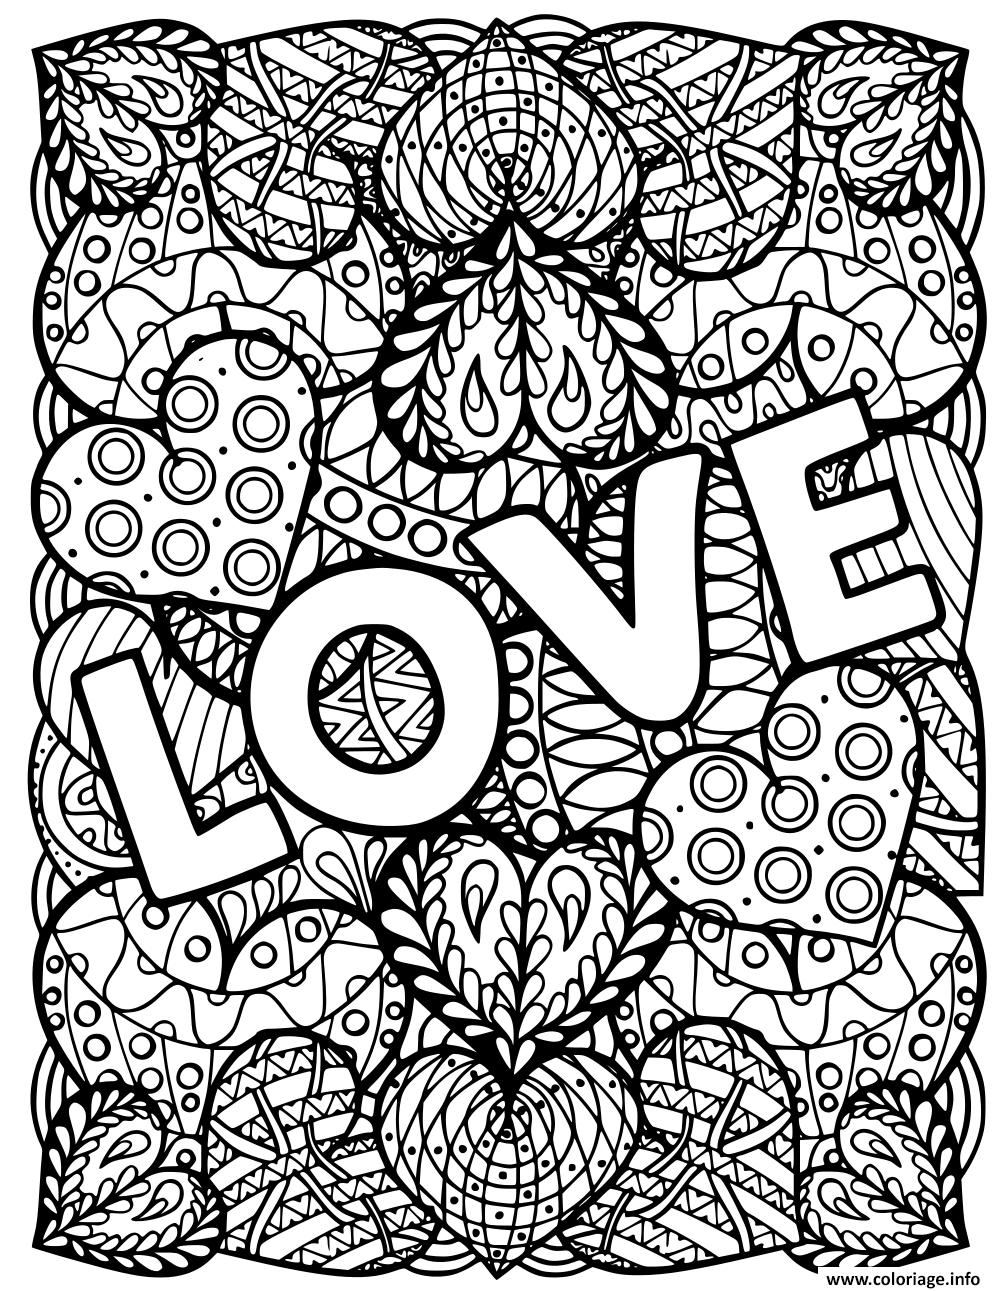 Coloriage Adulte Love Coeurs Saint Valentin dessin